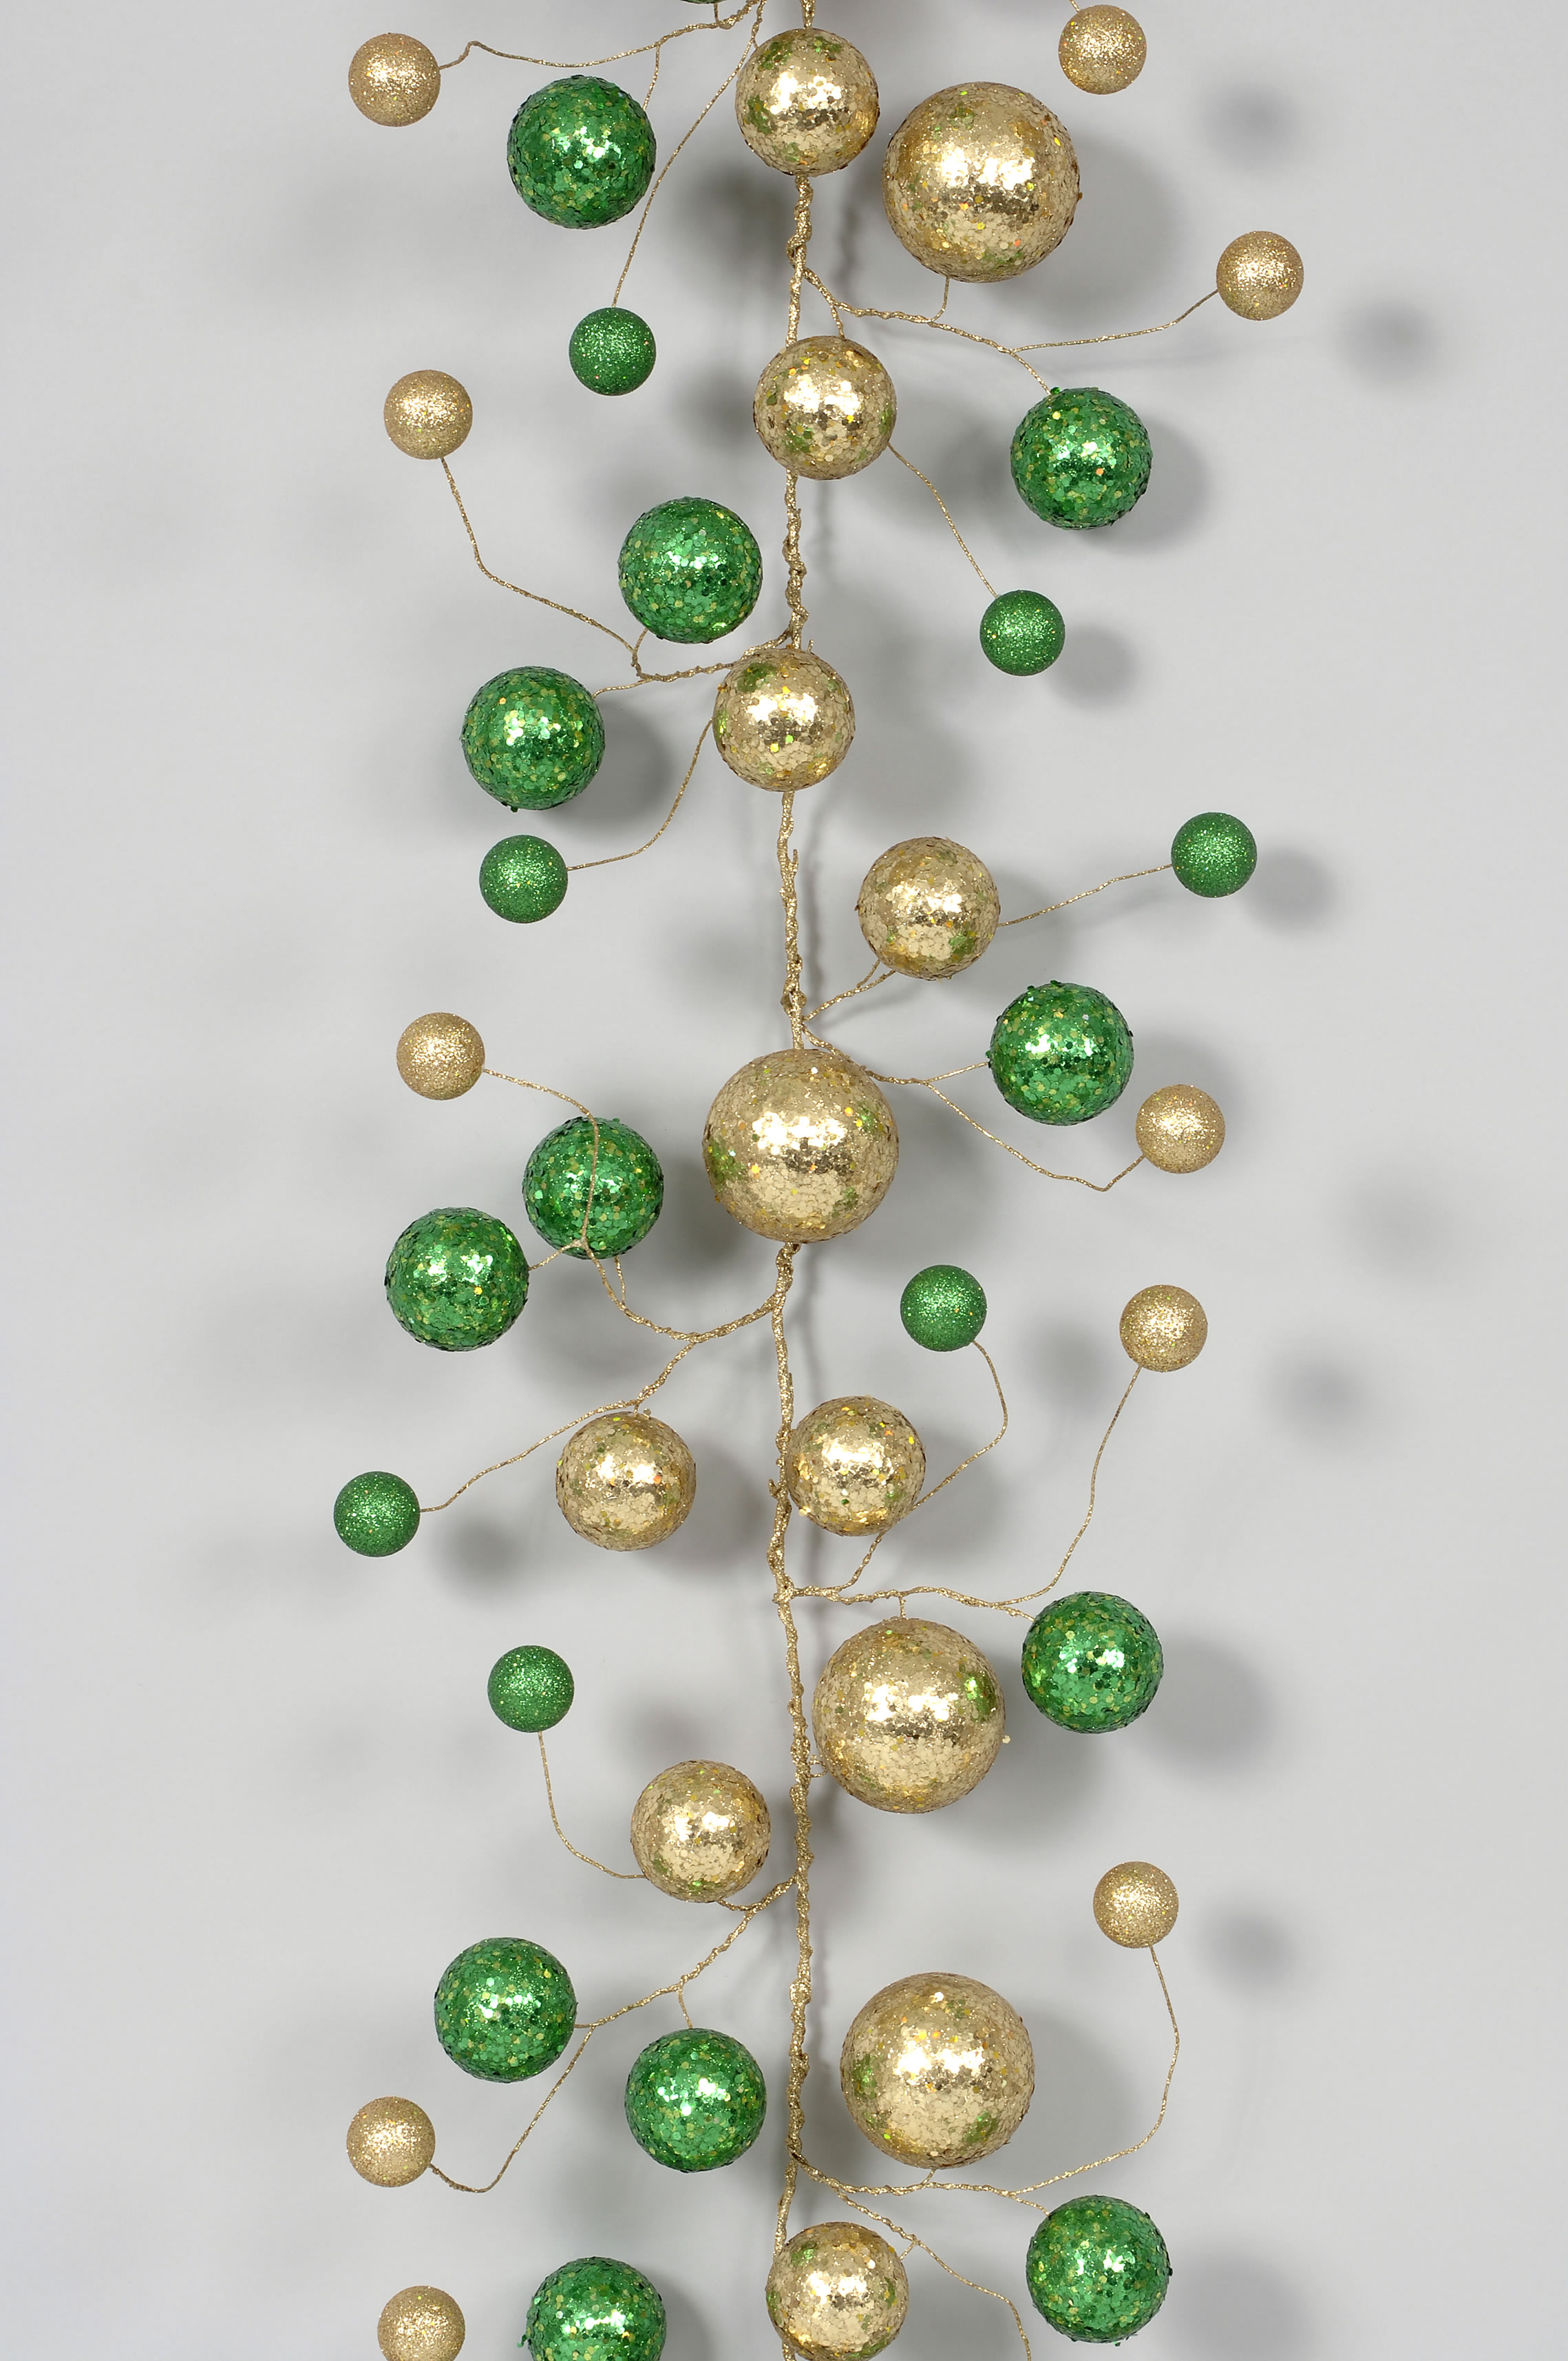 h40457 goldgreen 5 jumbo glittersequin styro ball garland